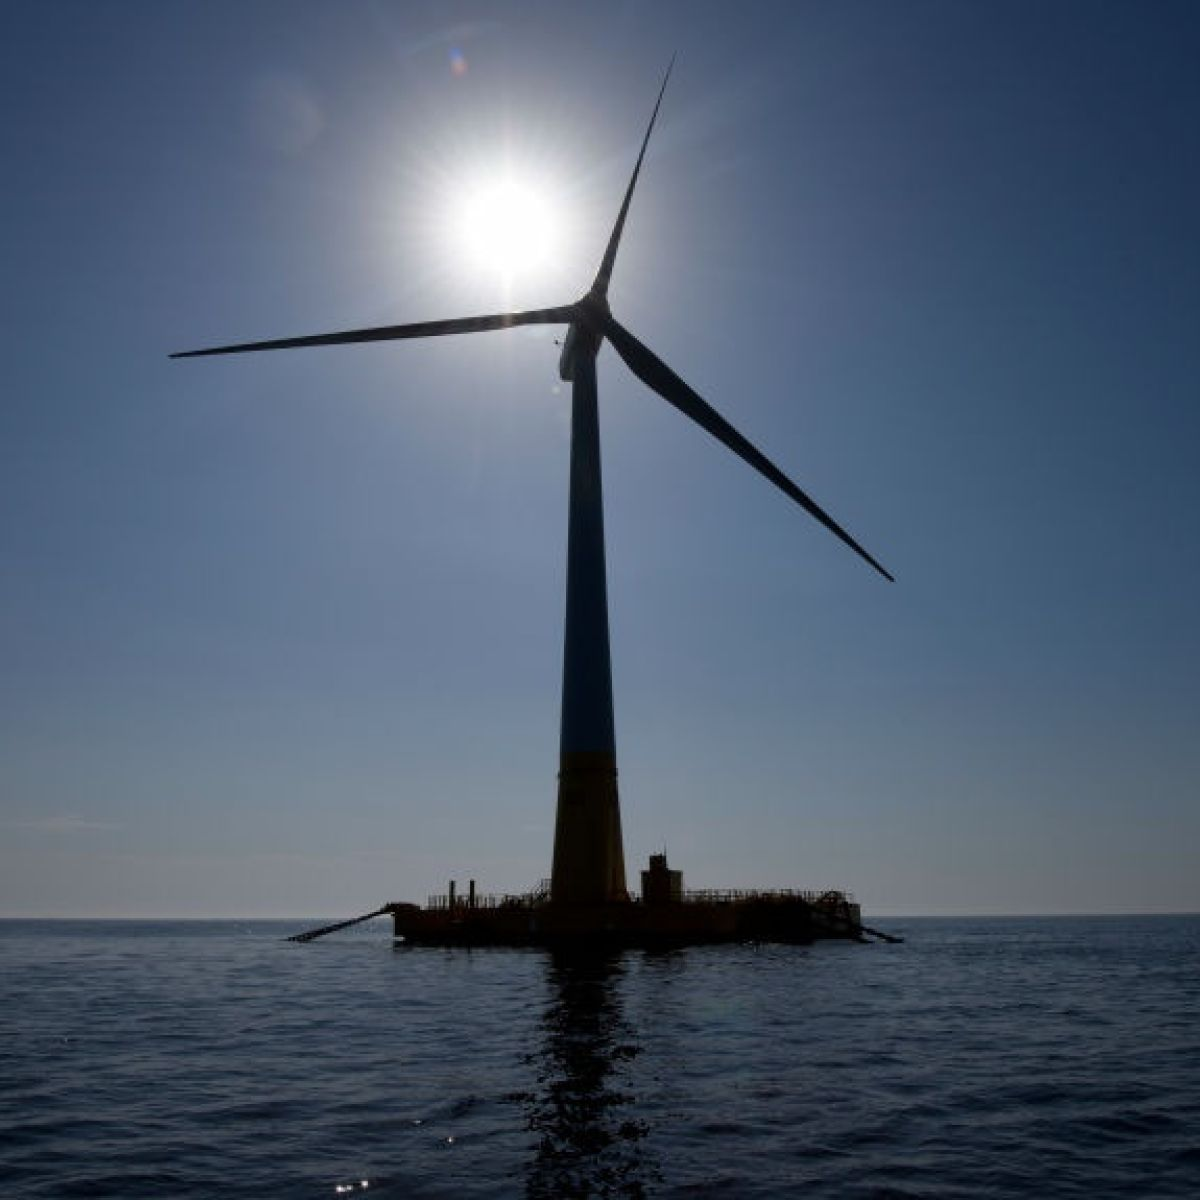 irishtimes.com - Kevin O'Sullivan - Floating wind energy can make Ireland 'renewable superpower'